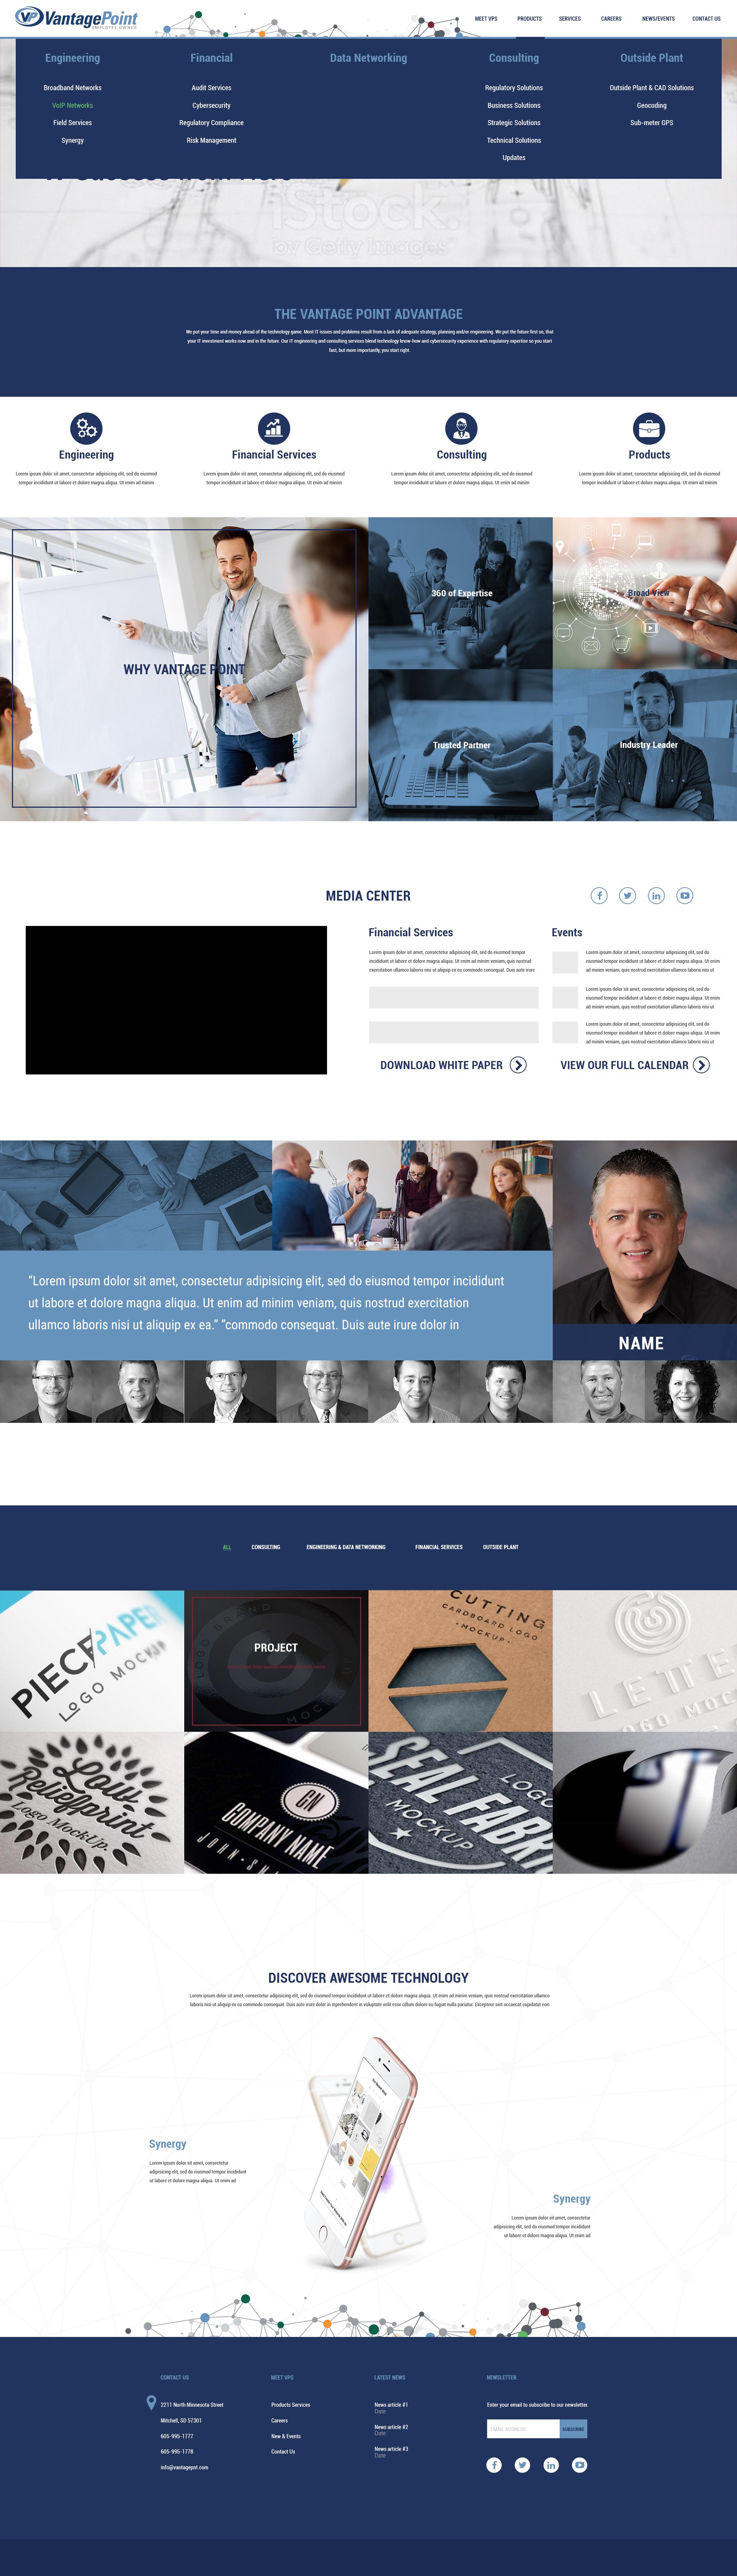 Vantage Point Design #2 - Homepage Hover